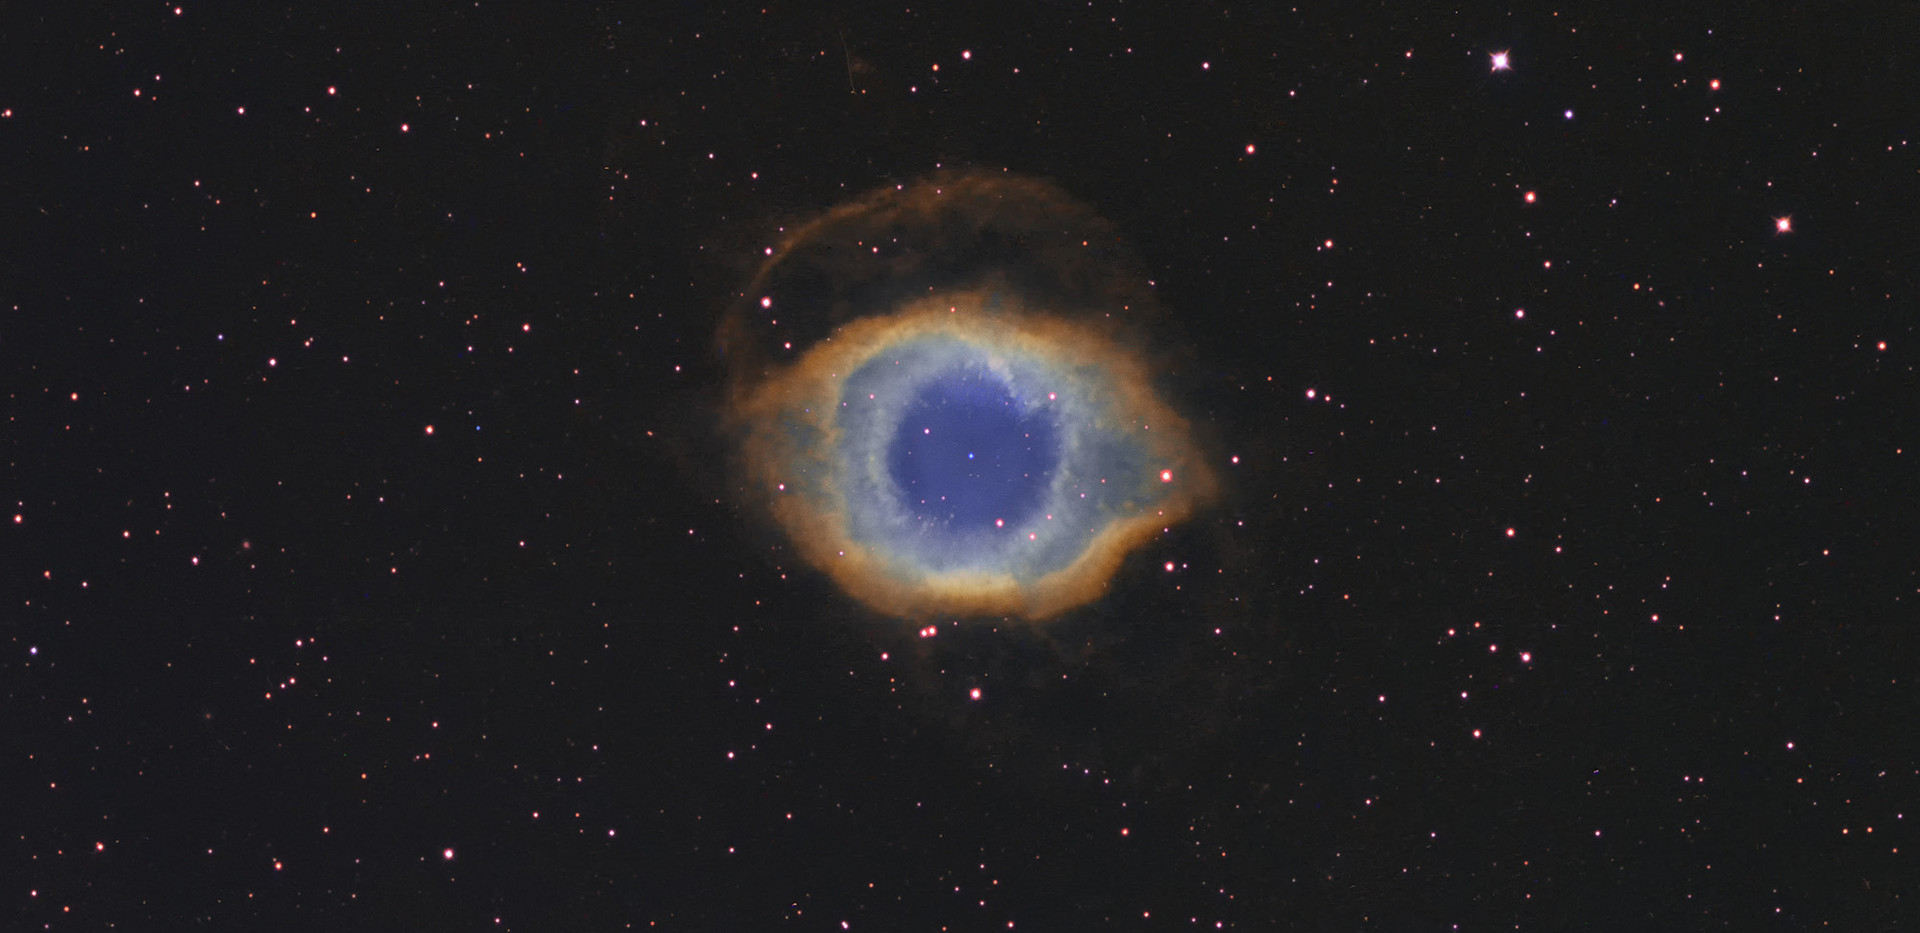 NGC7293_FDK250_AltaU16M_C200HD_Shin.jpg